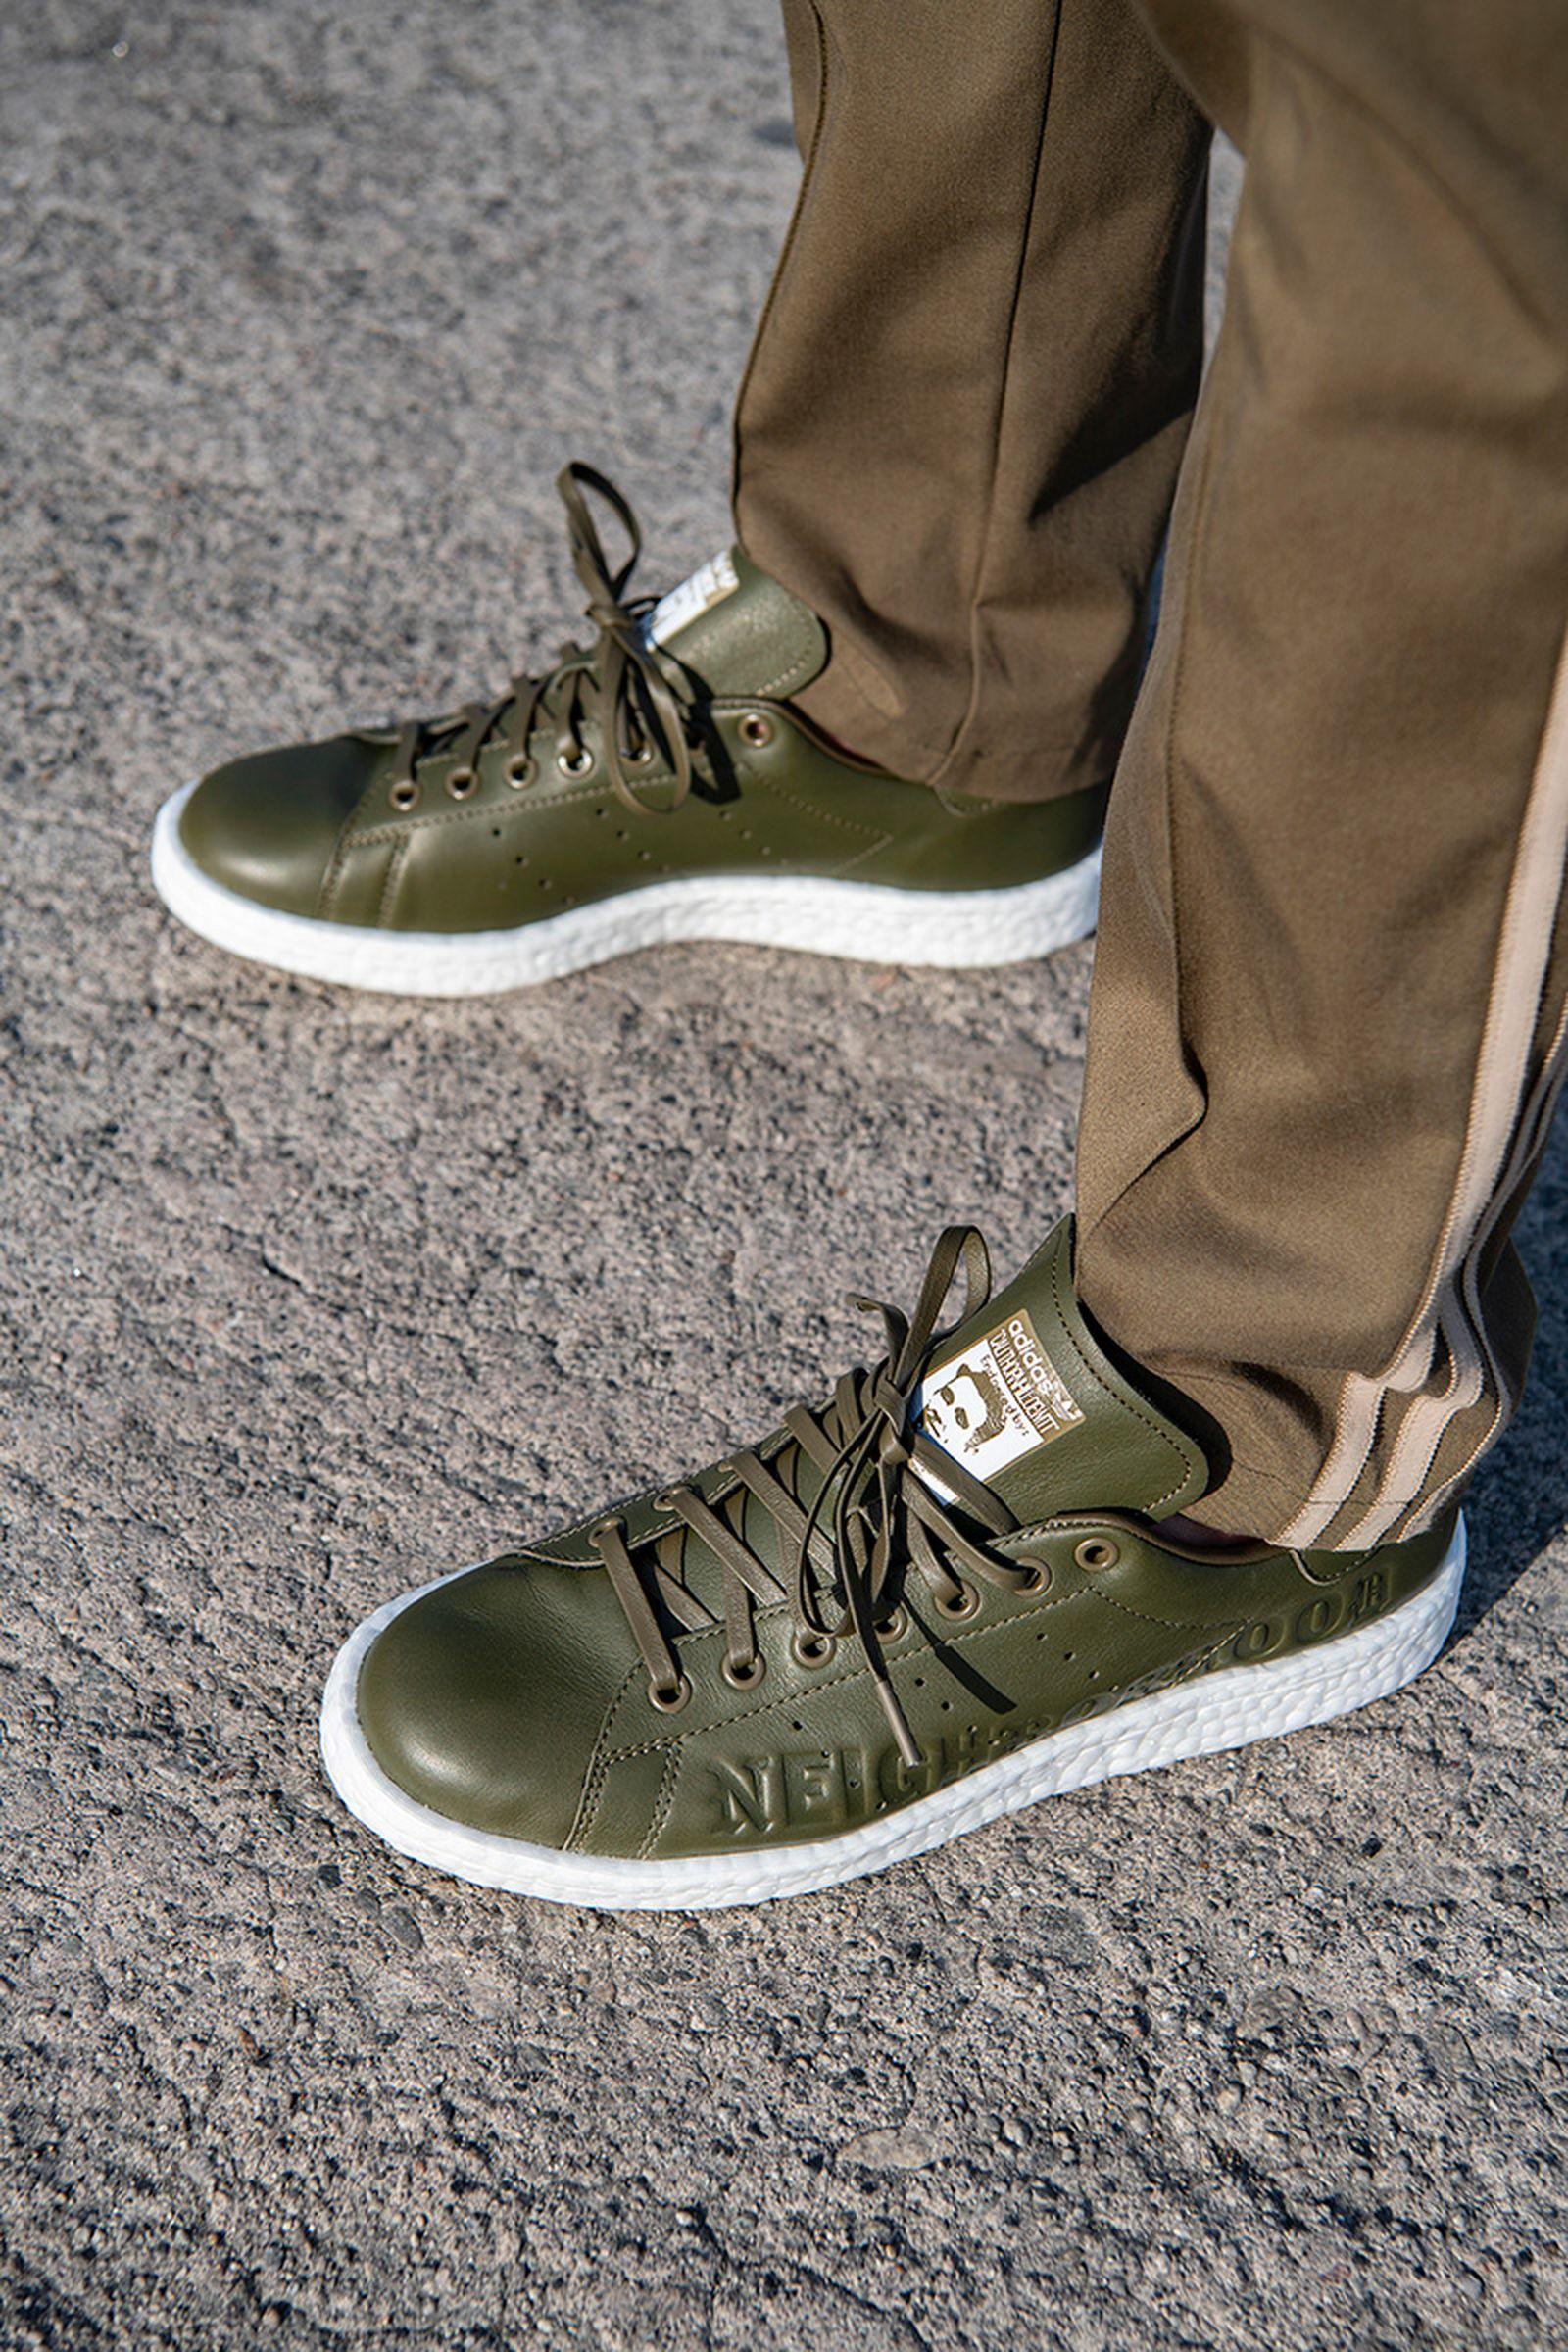 adidas neighborhood kamada release date price more info08